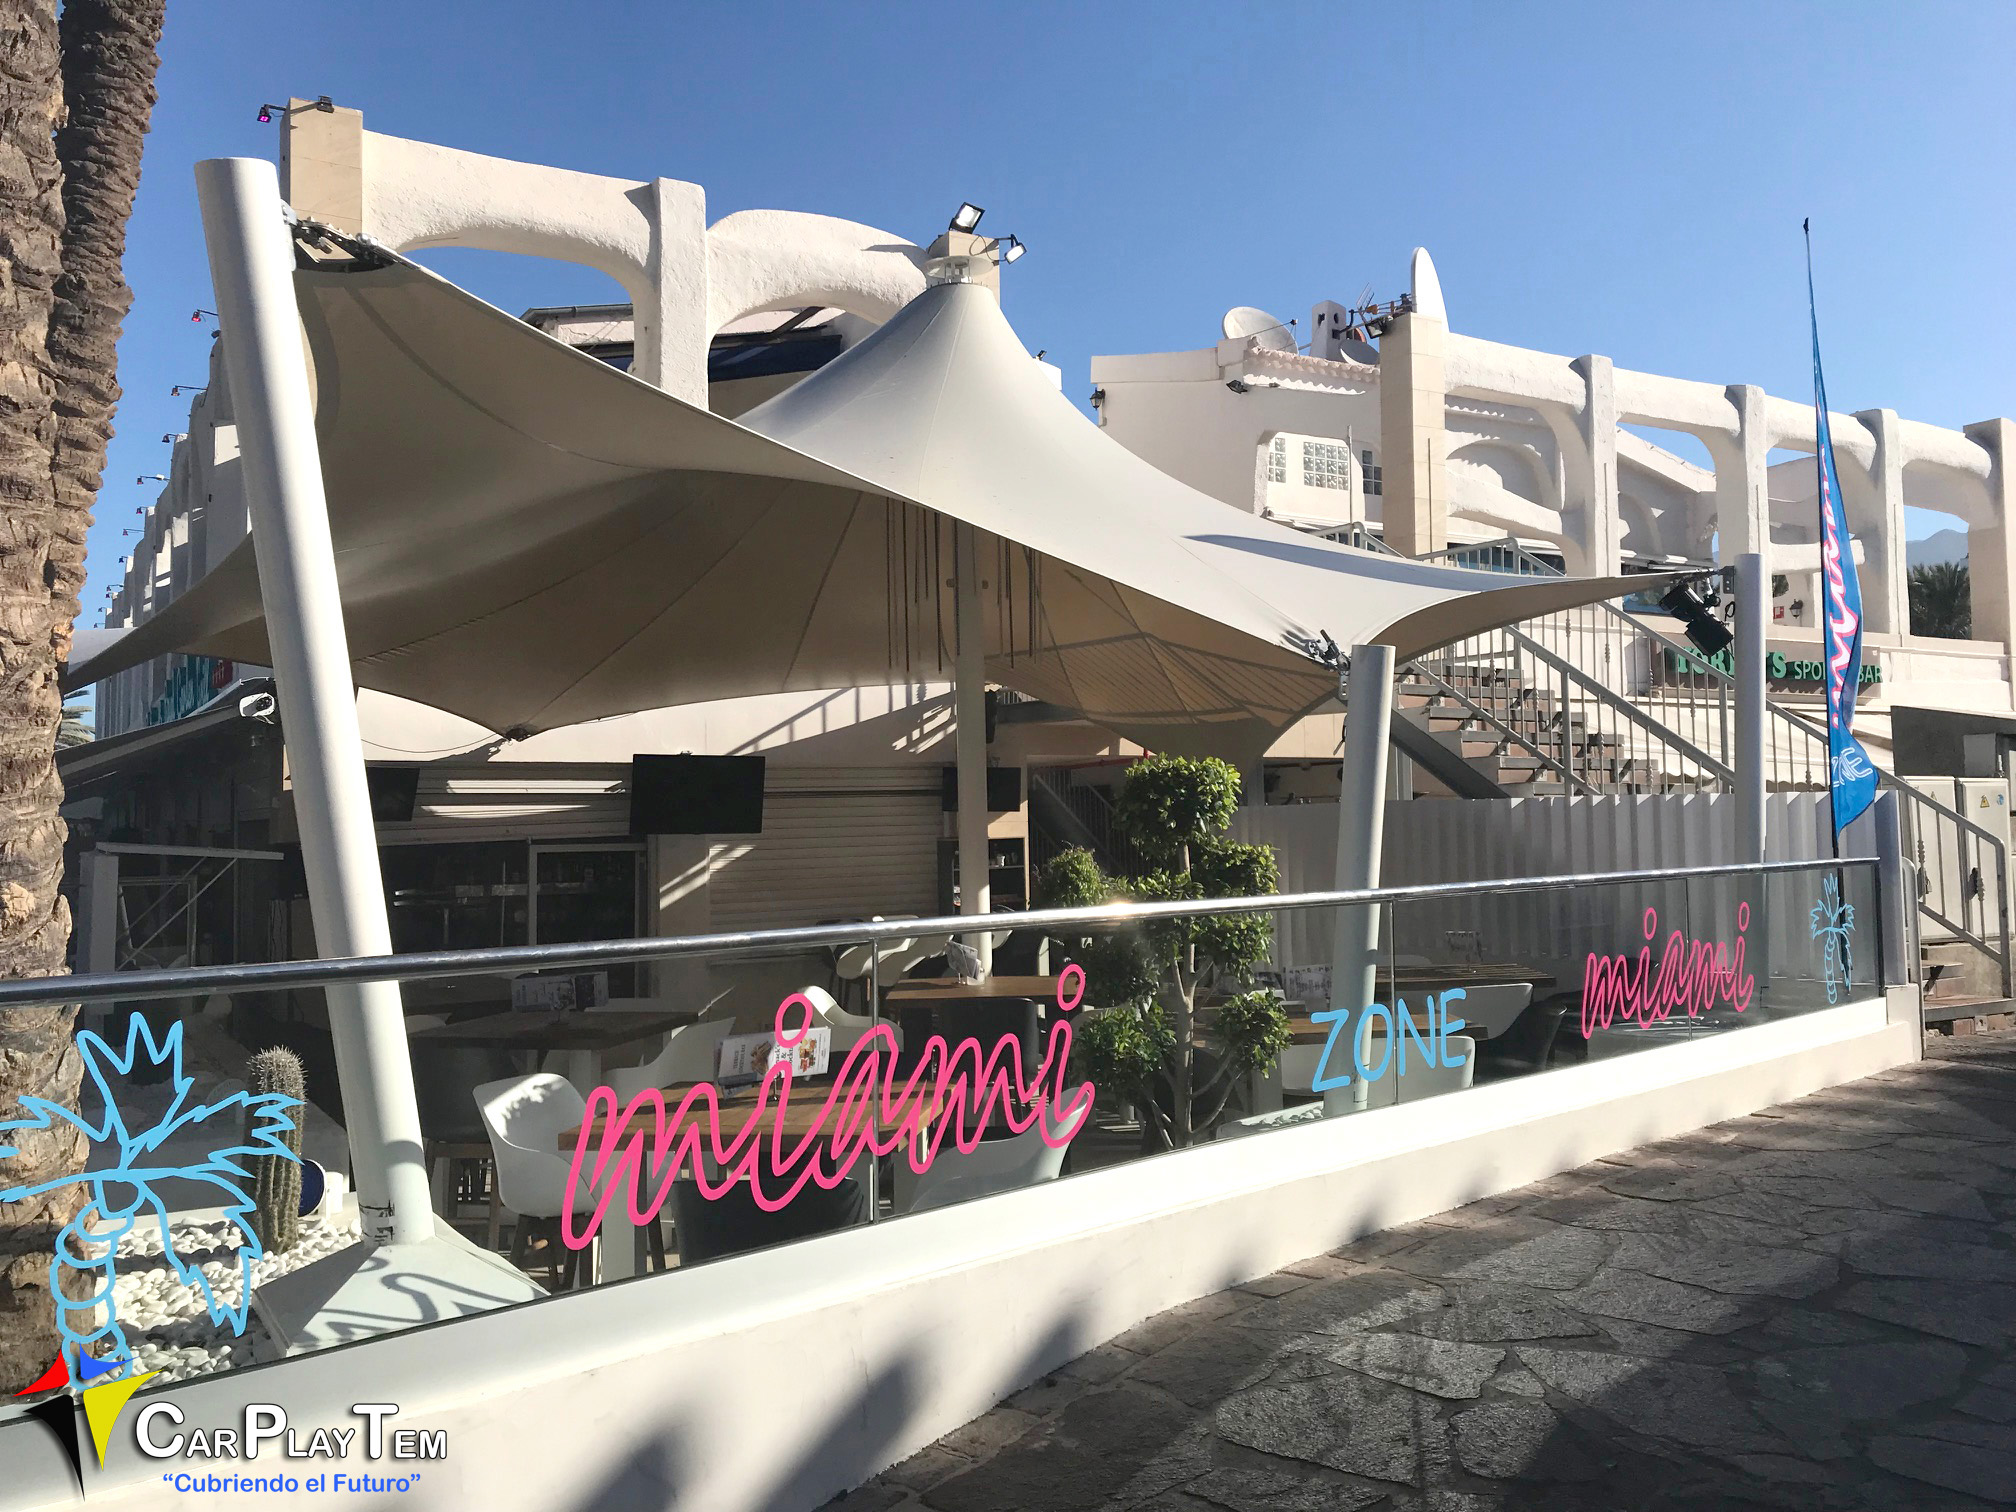 Carpa en Forma de Cúpula. Terraza Miami. Tenerife.